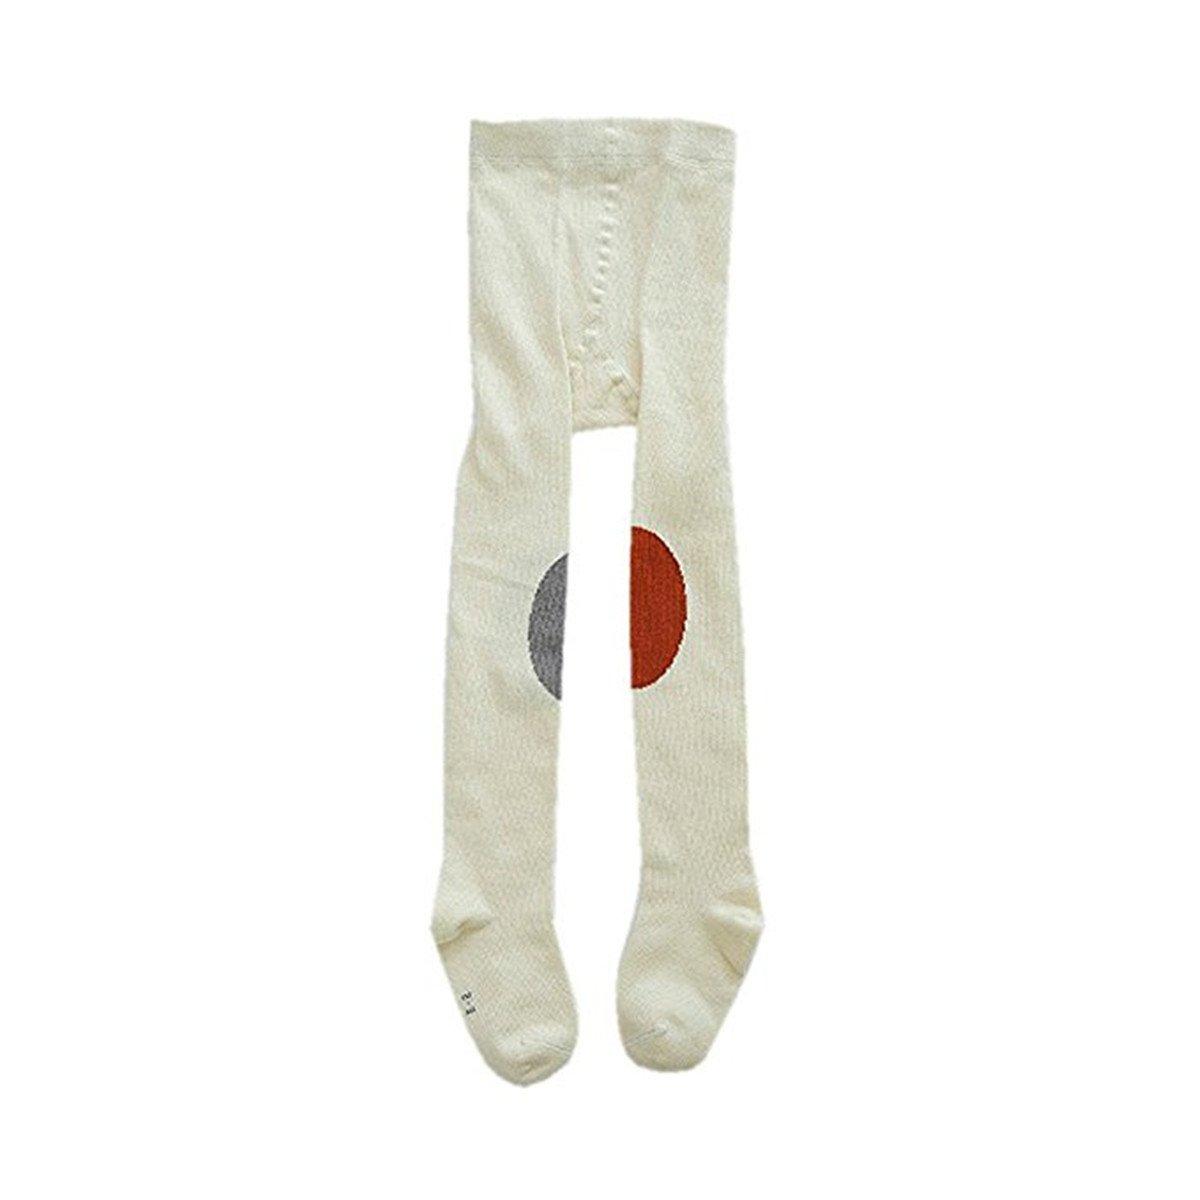 JELEUON Kids Baby Girls Stocks Legging Pants Tights Leg Warm Stocking